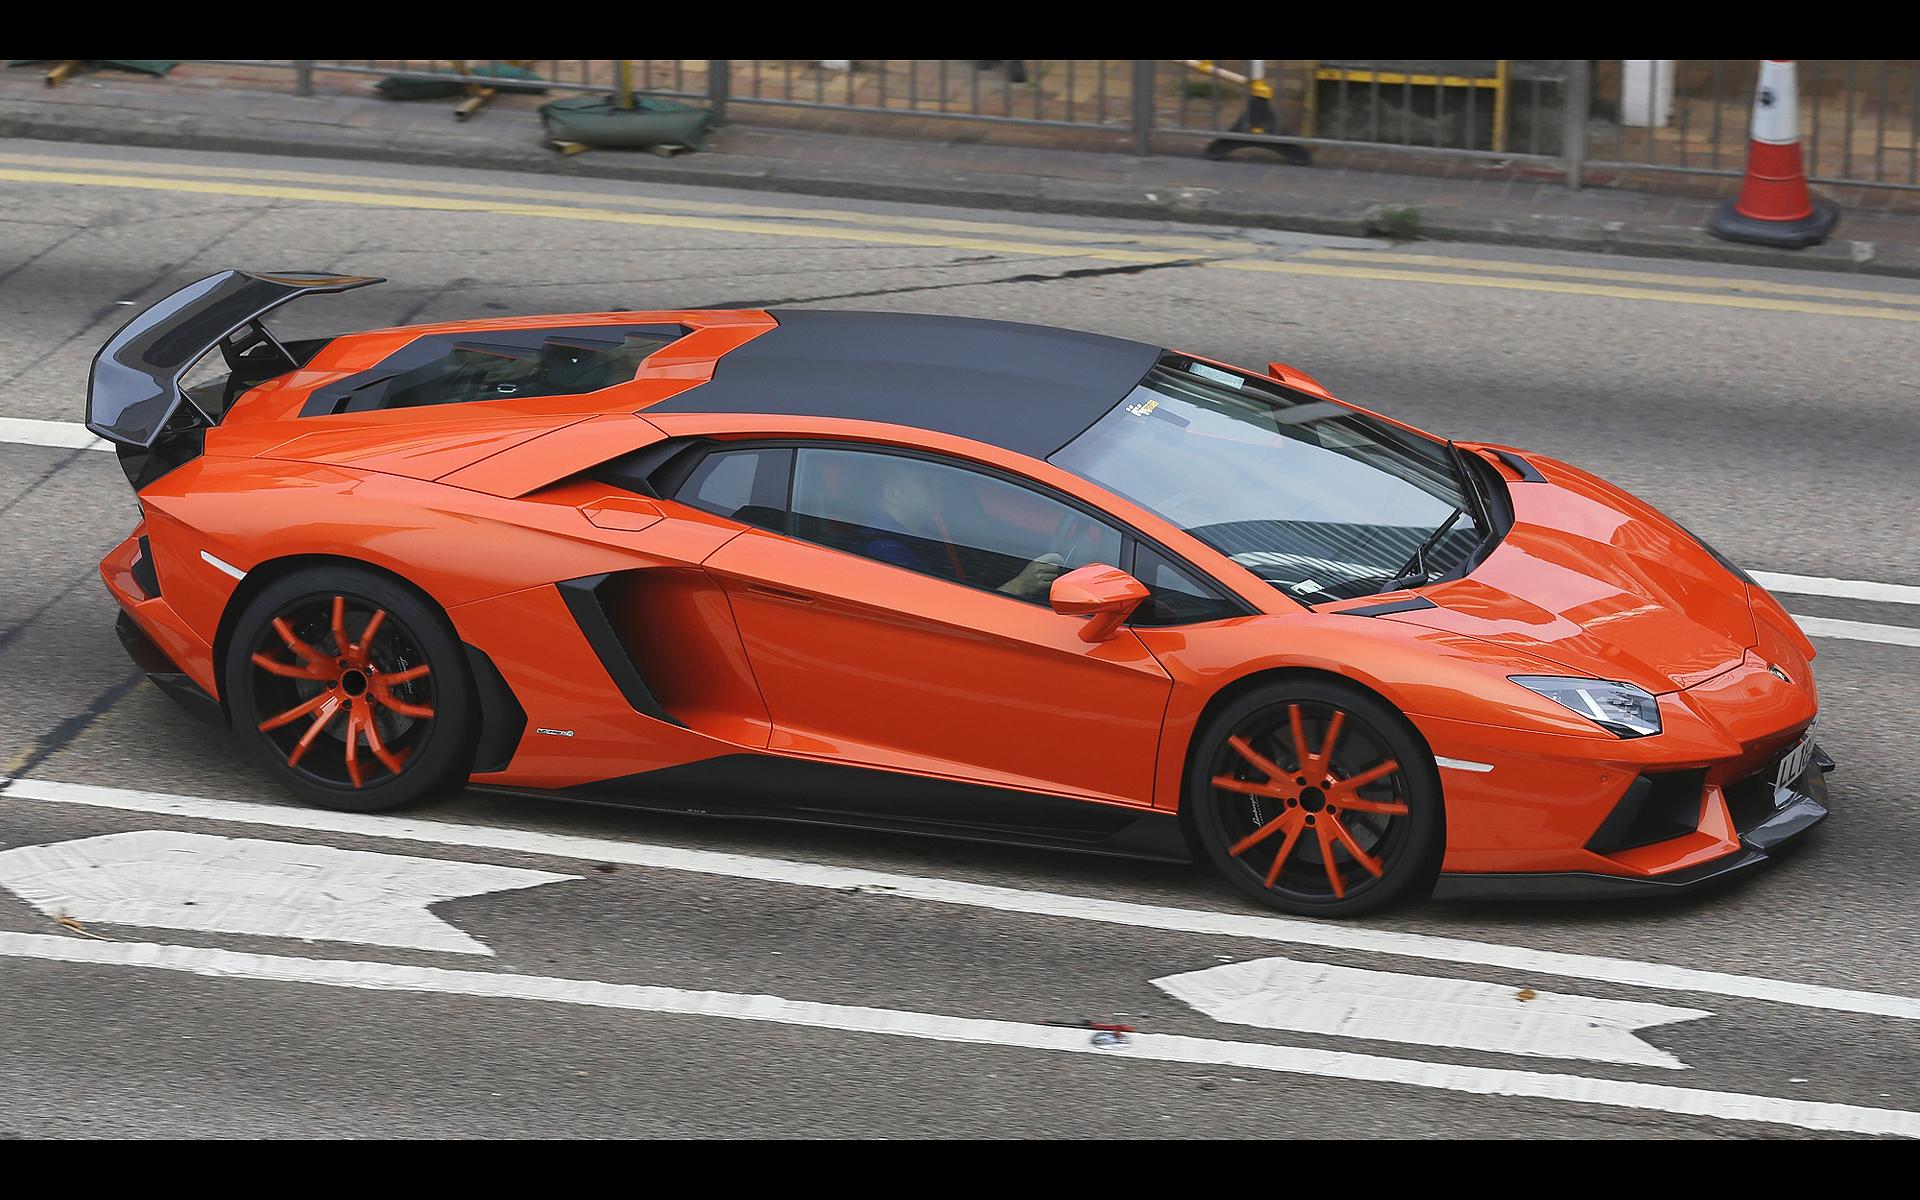 Orange Dmc Aventador LP900